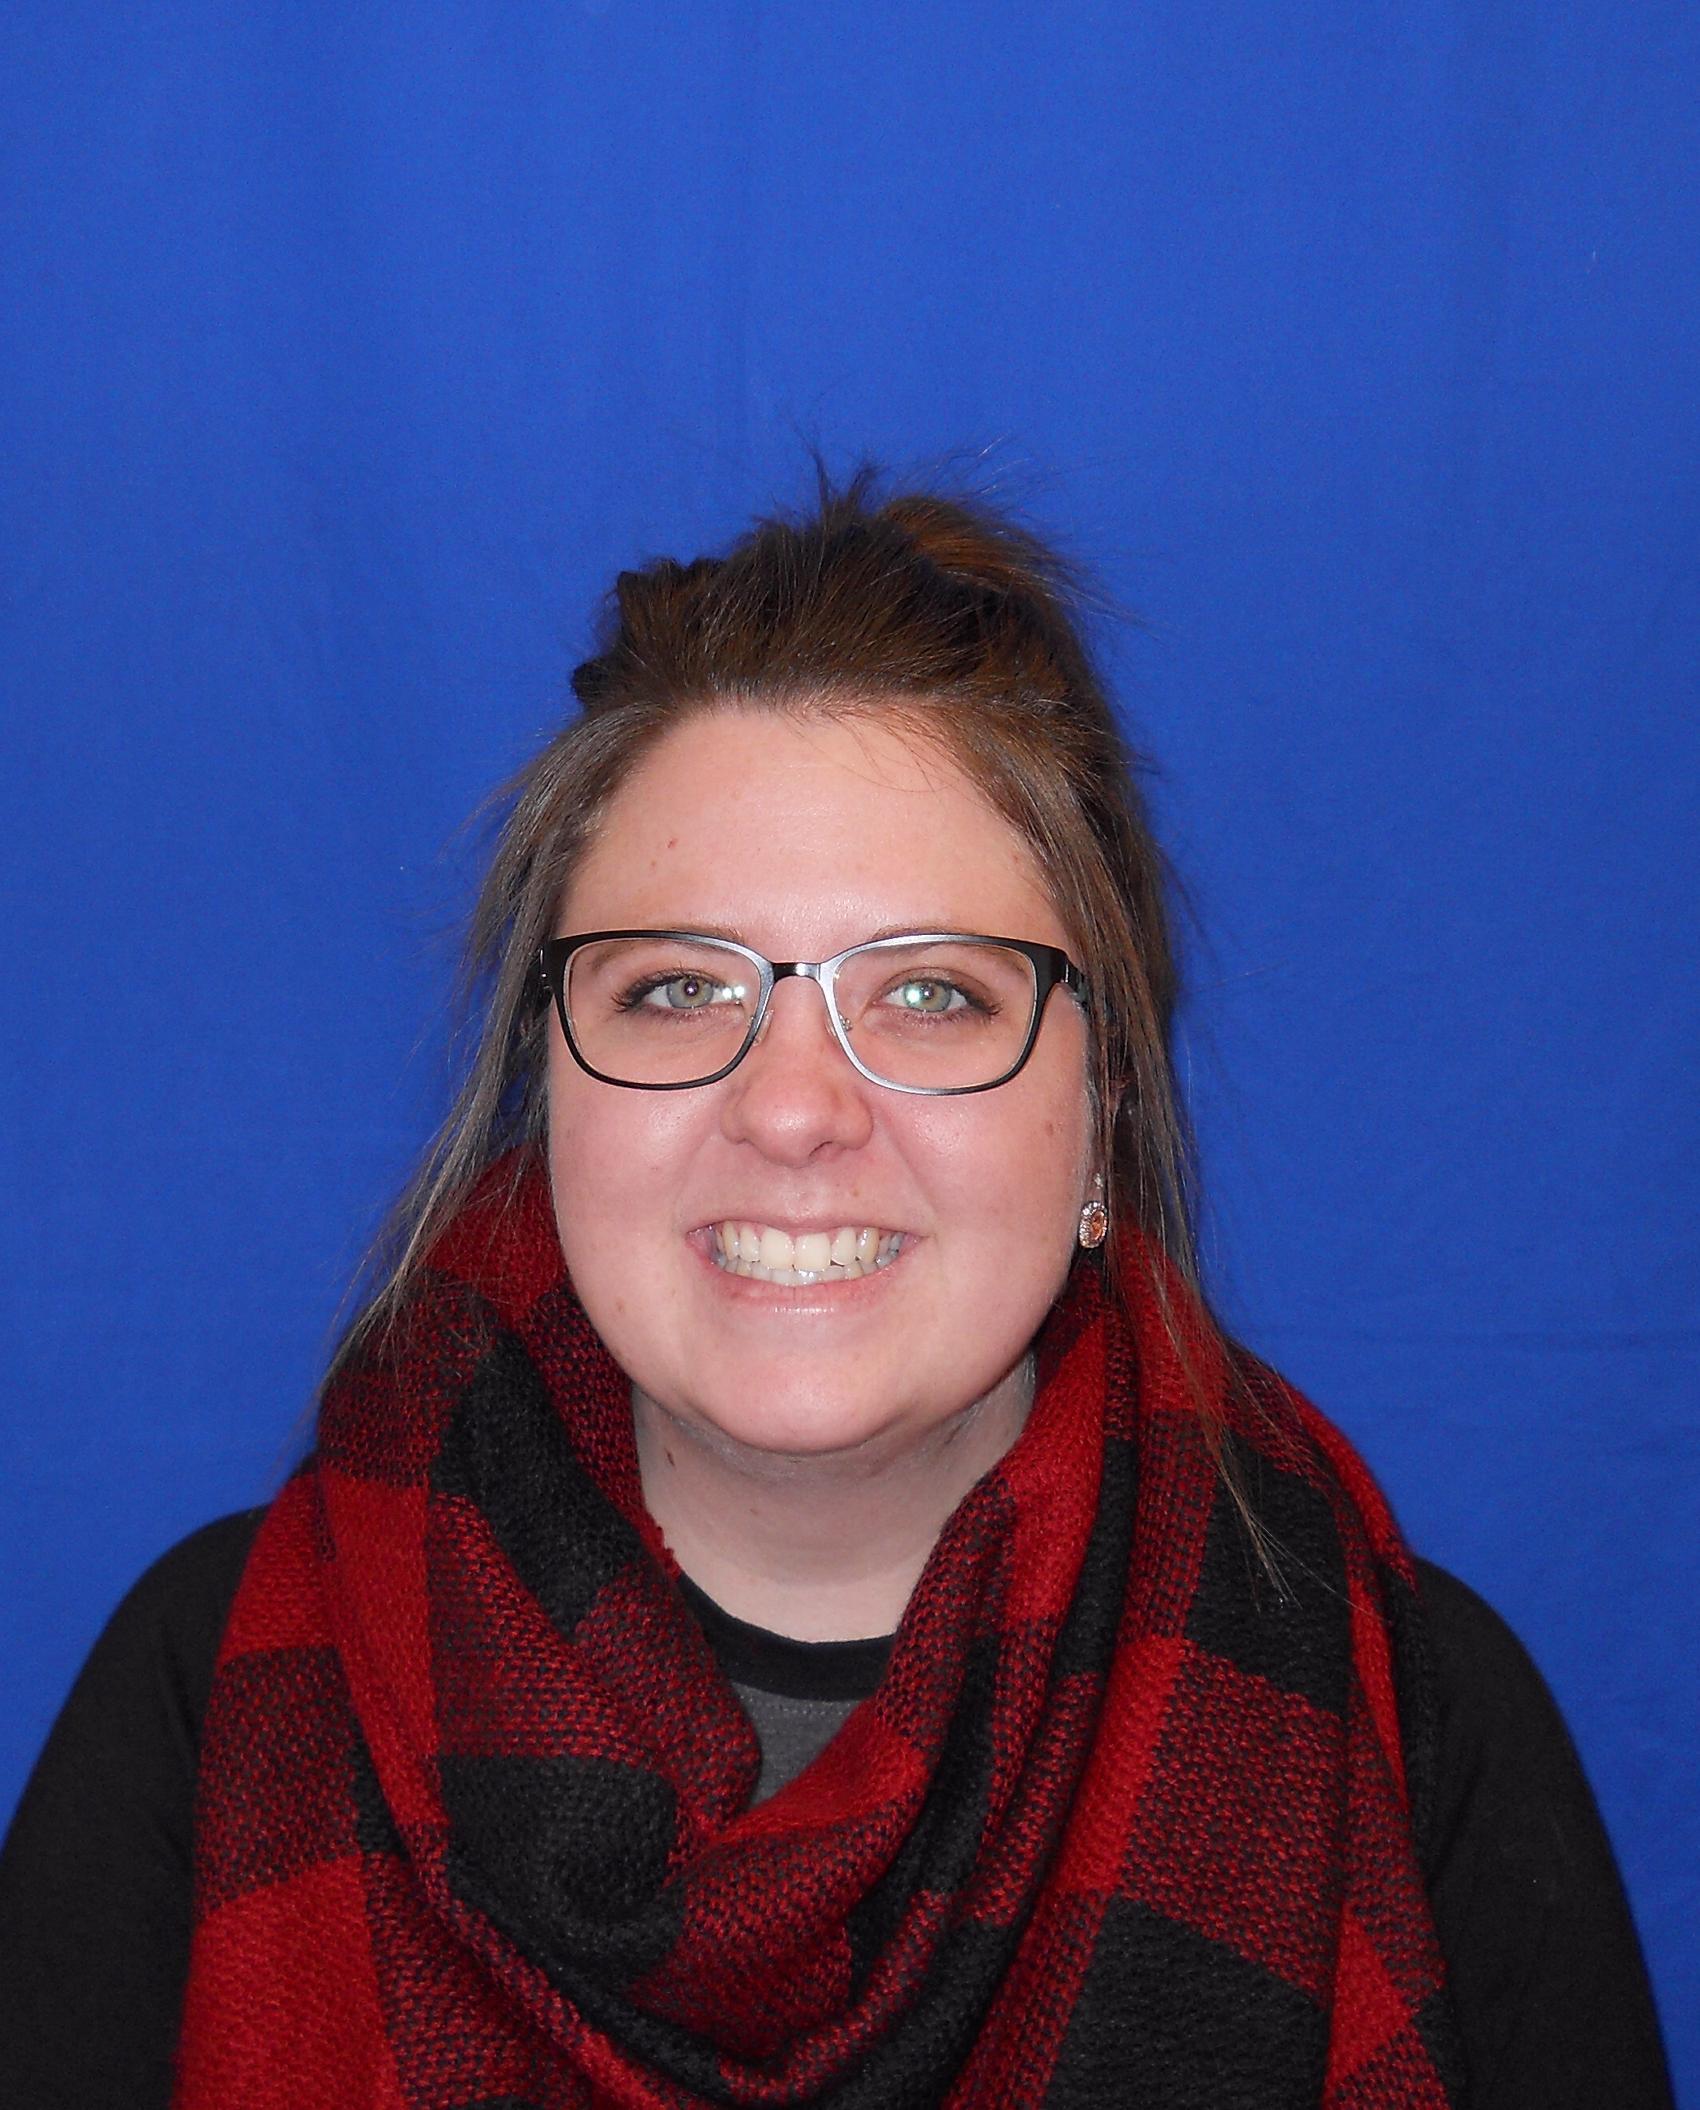 photo of GRUBER EMILY